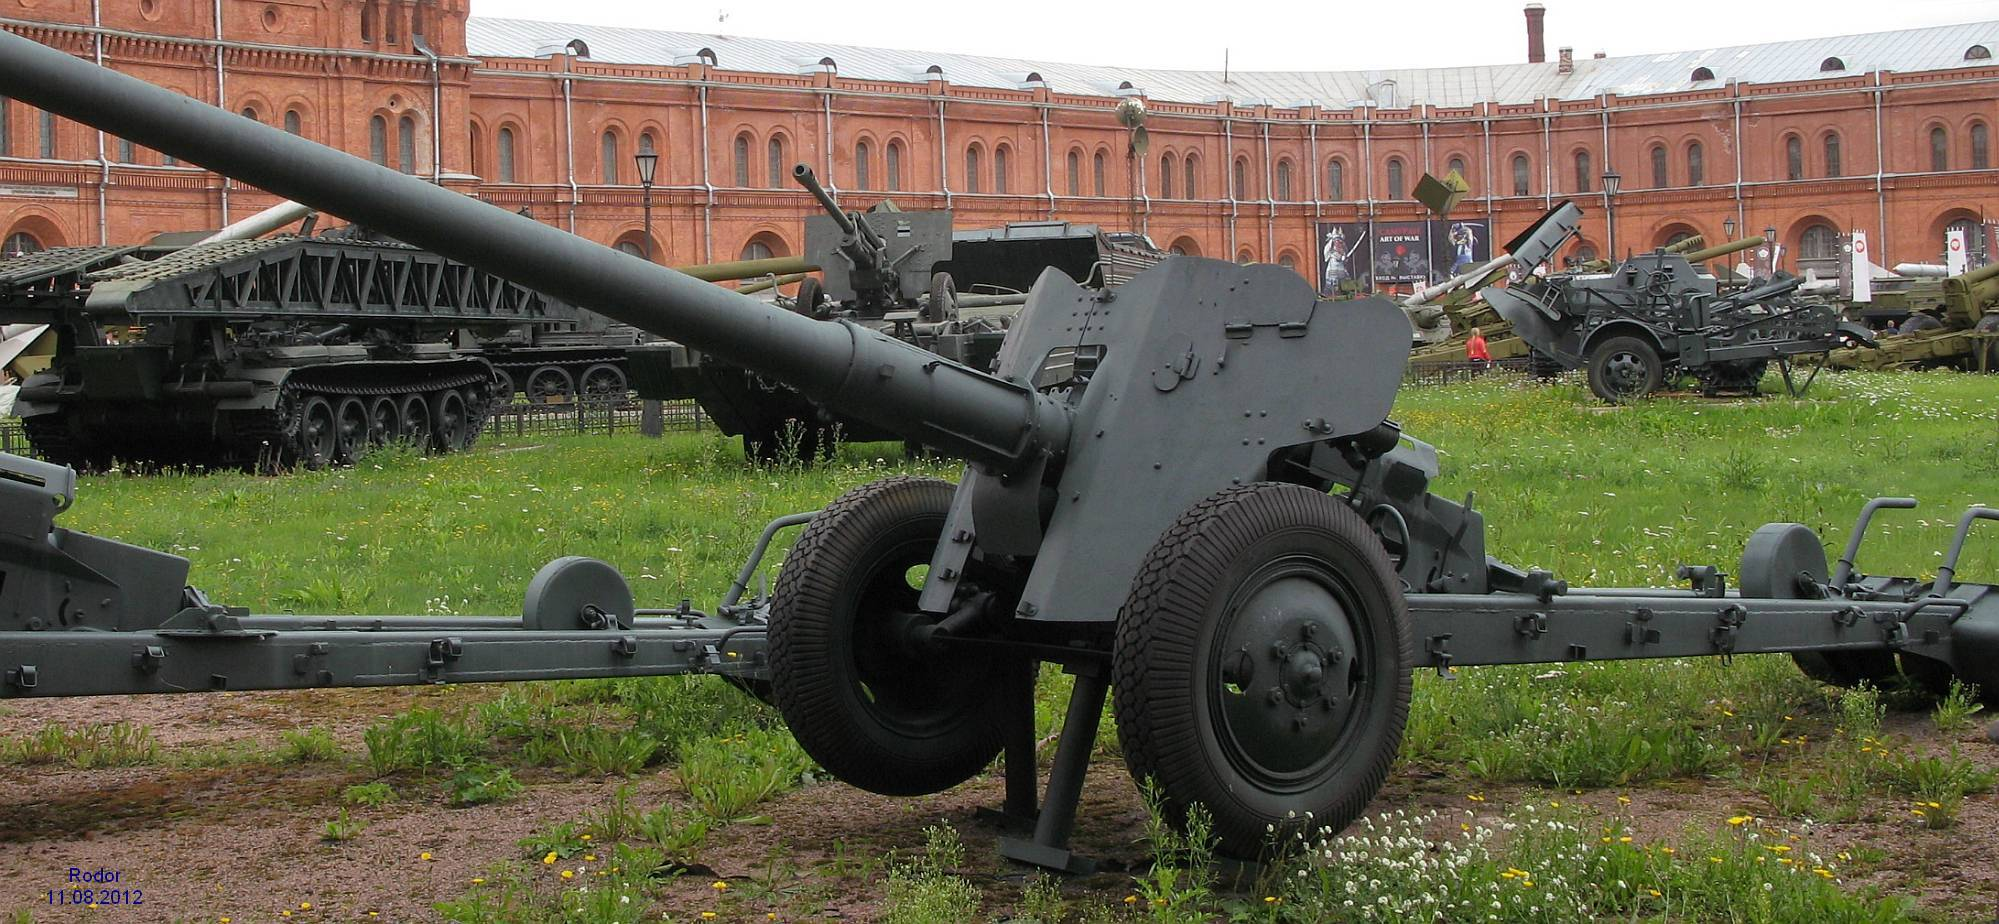 85-мм противотанковая пушка д-48 — википедия